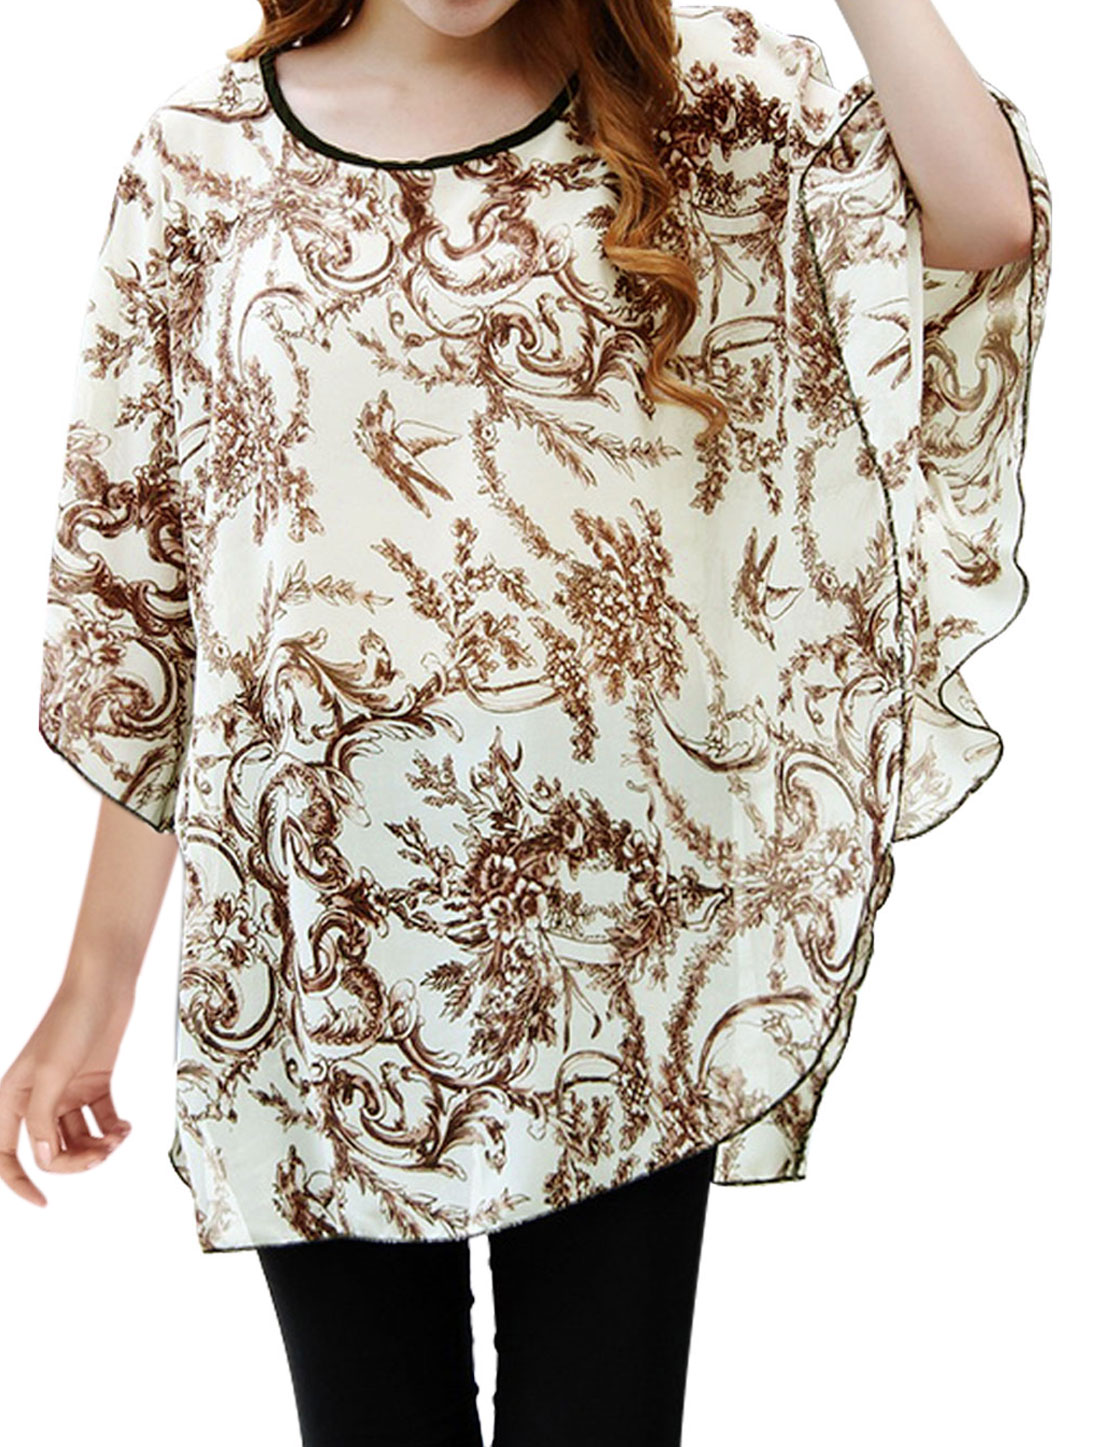 Lady Flower Vine Print Round Hem Dolman Sleeve Chiffon Blouse Beige Brown S